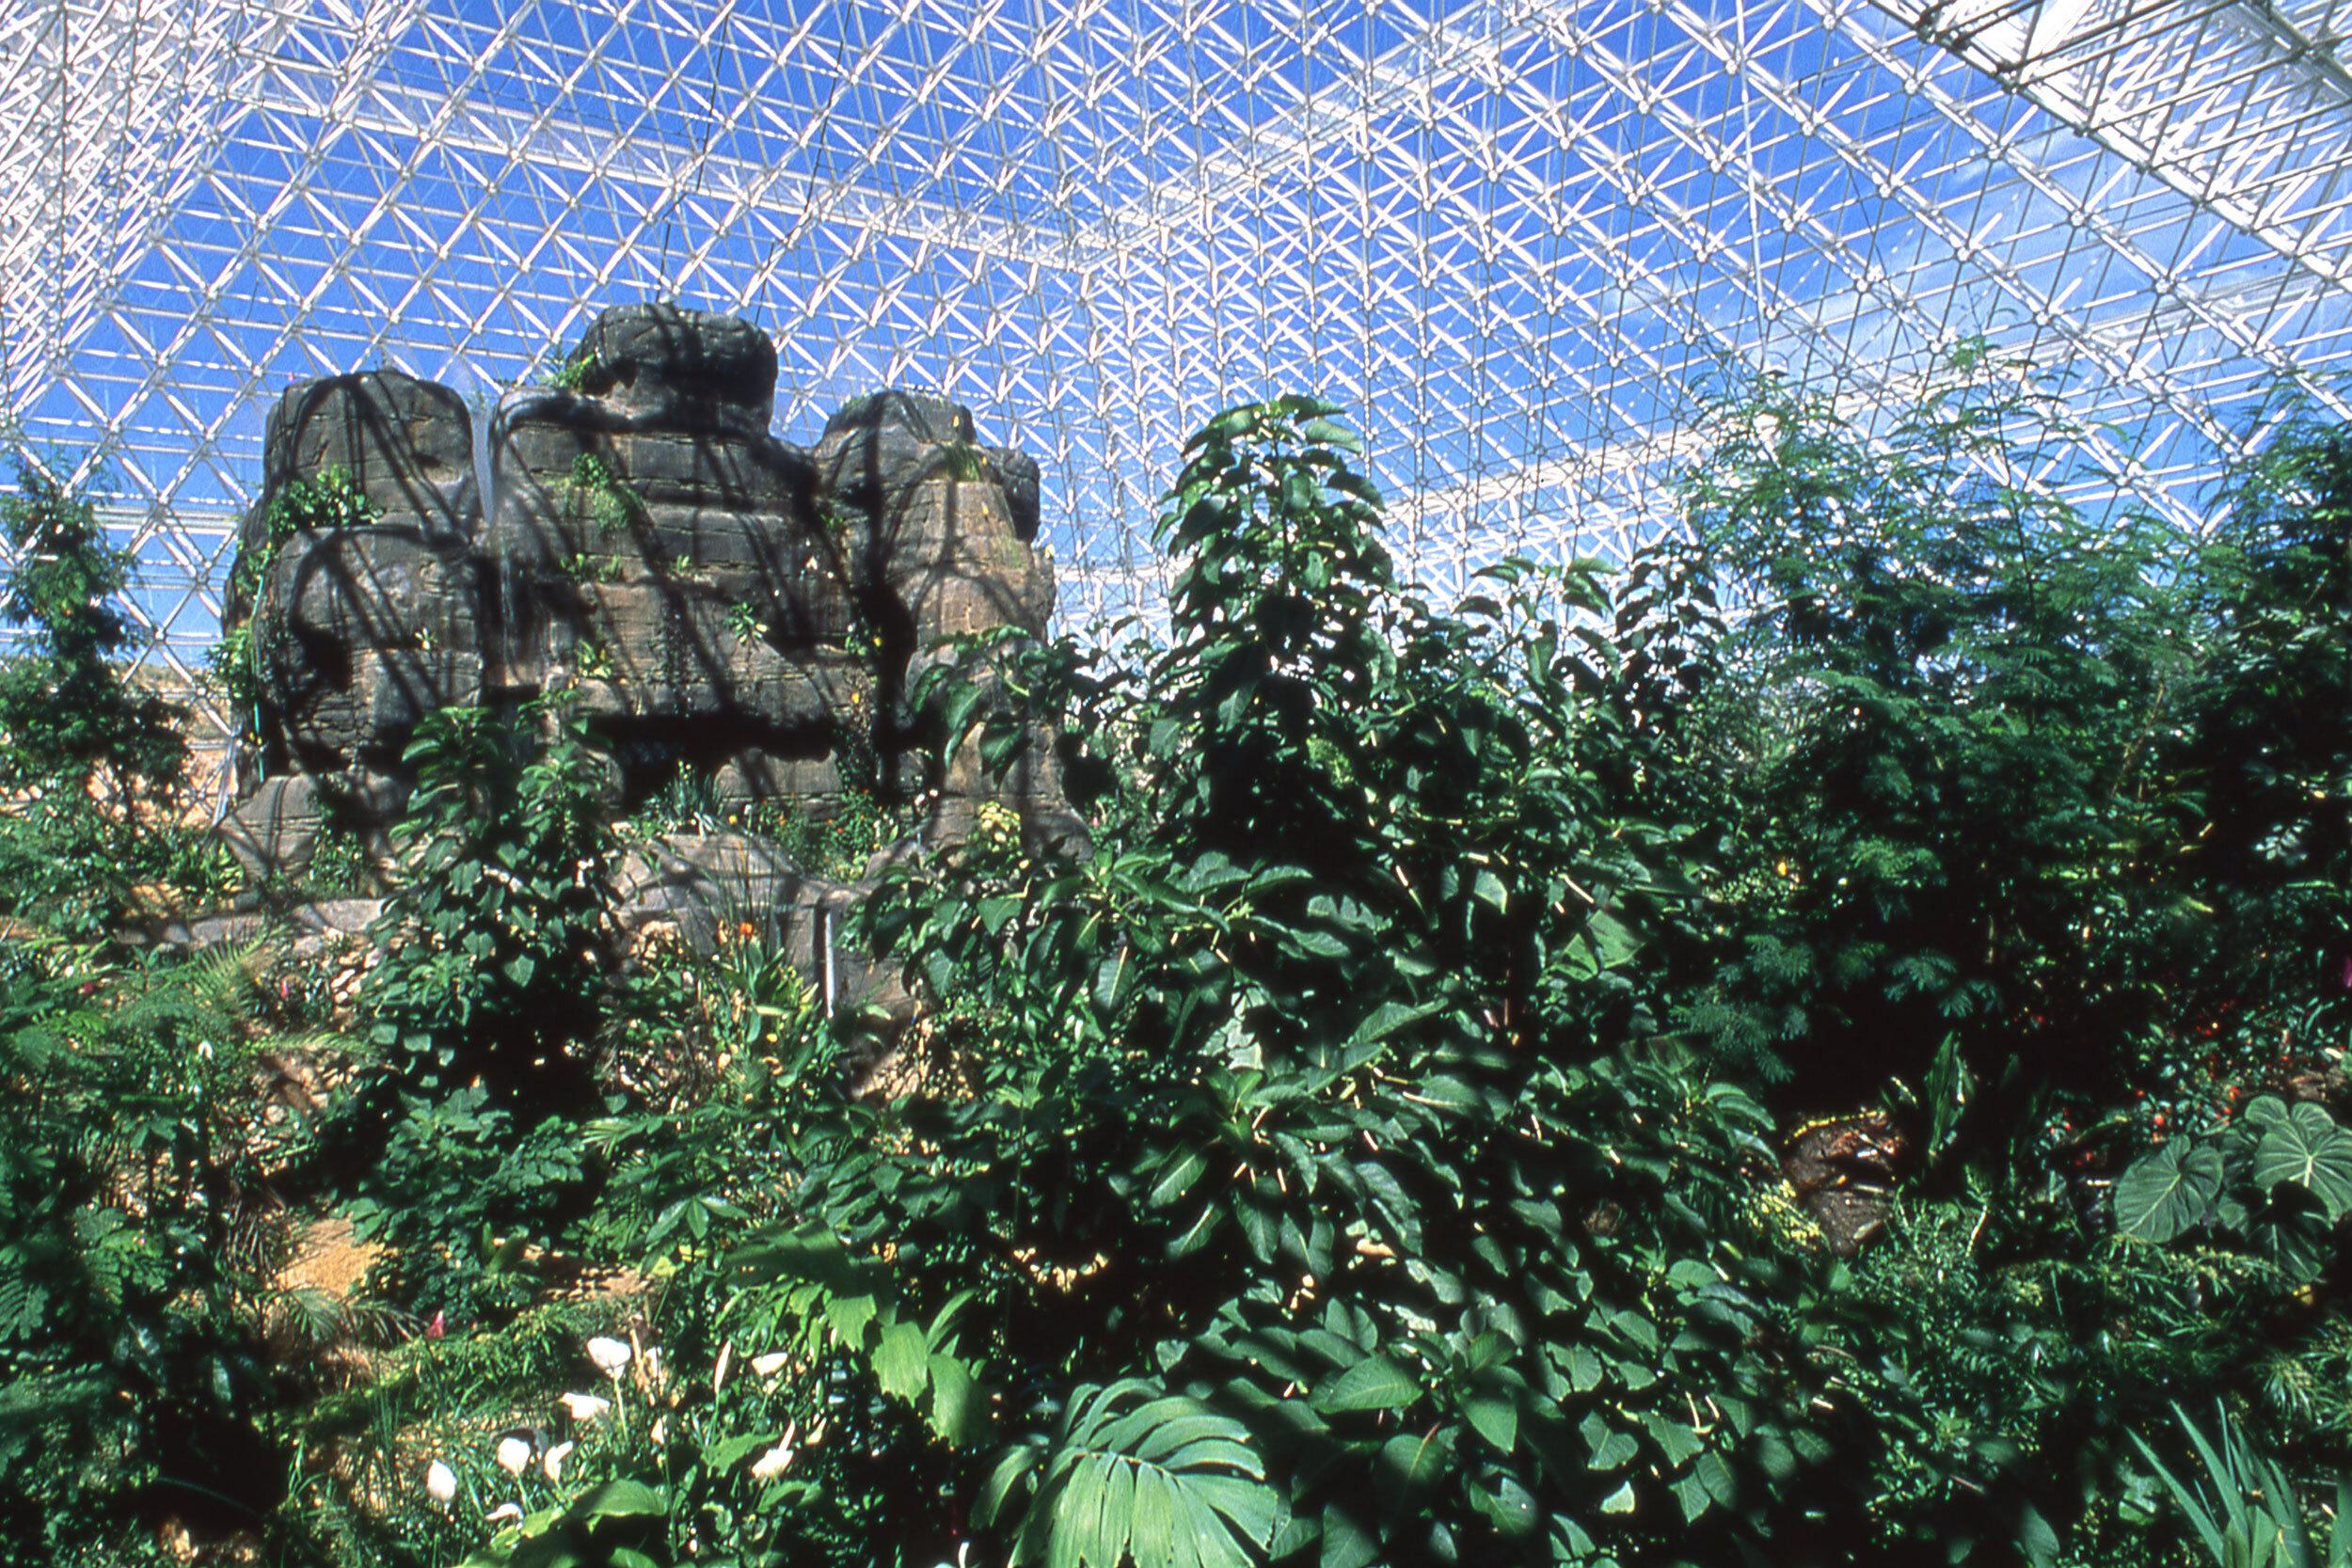 Rainforest biome  in the Biosphere 2